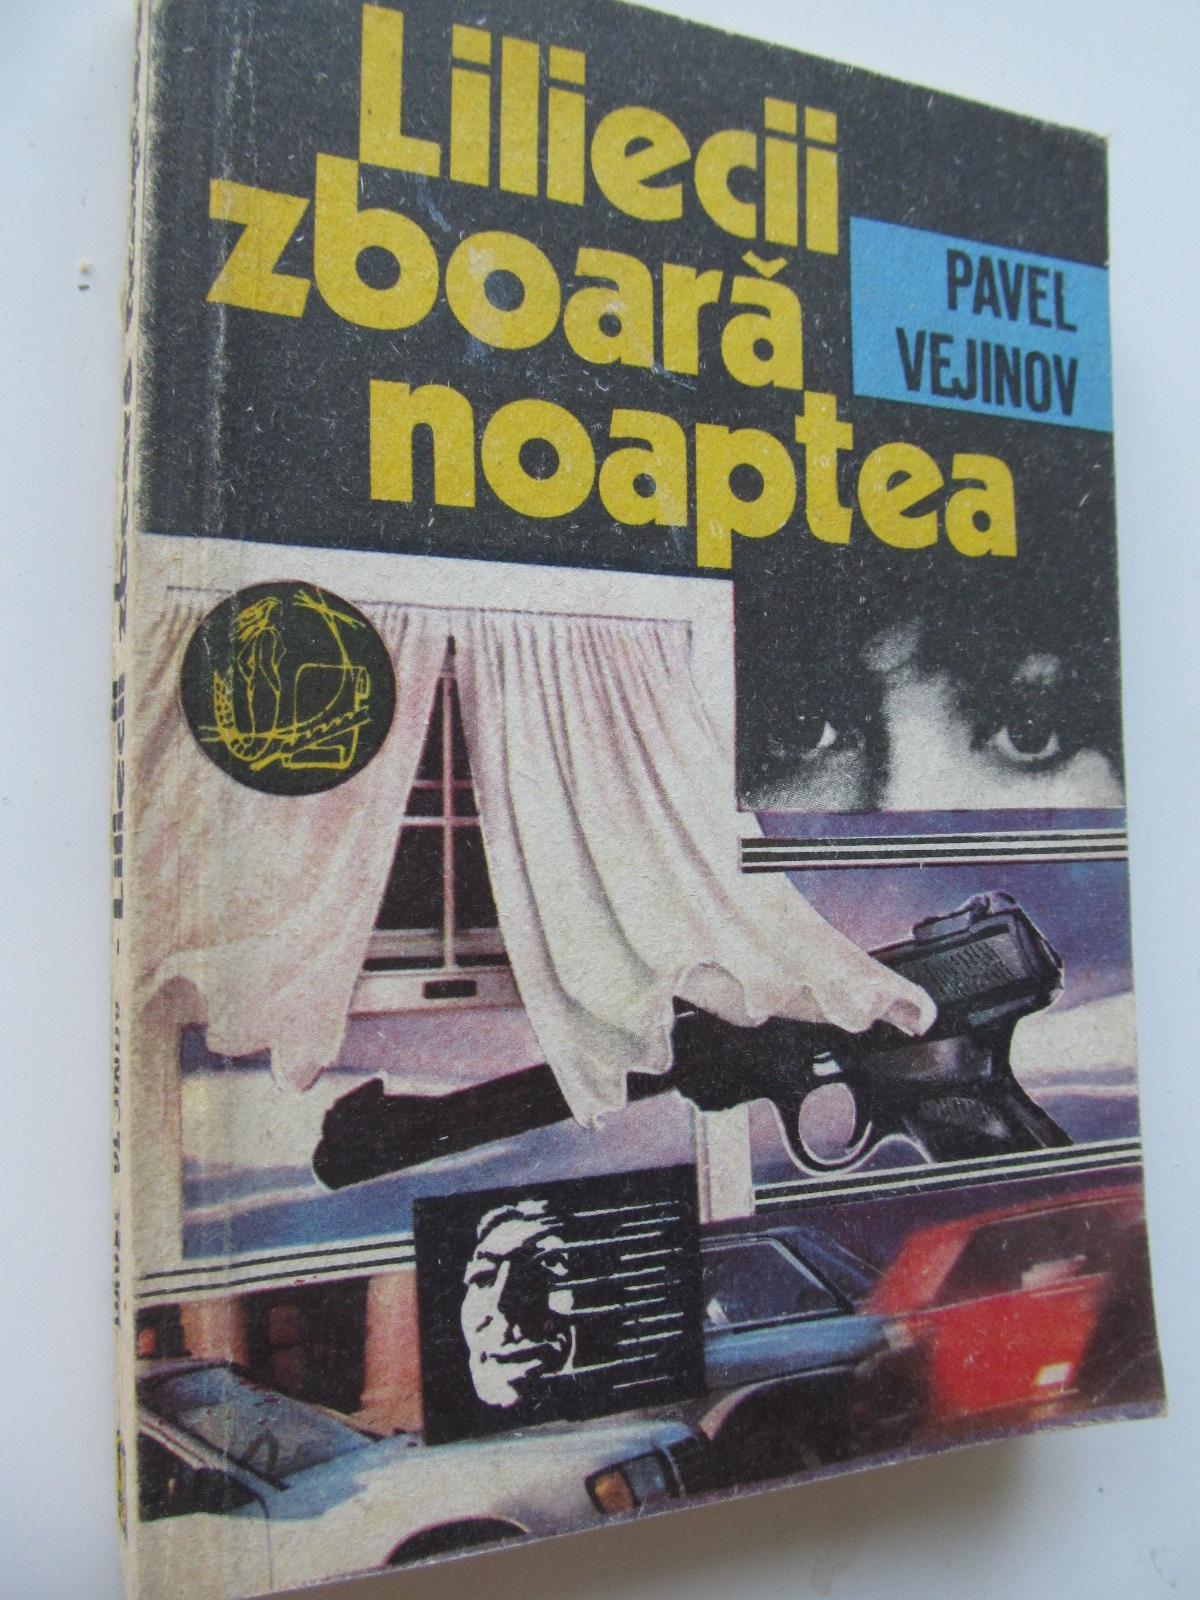 Liliecii zboara noaptea - Pavel Vejinov | Detalii carte